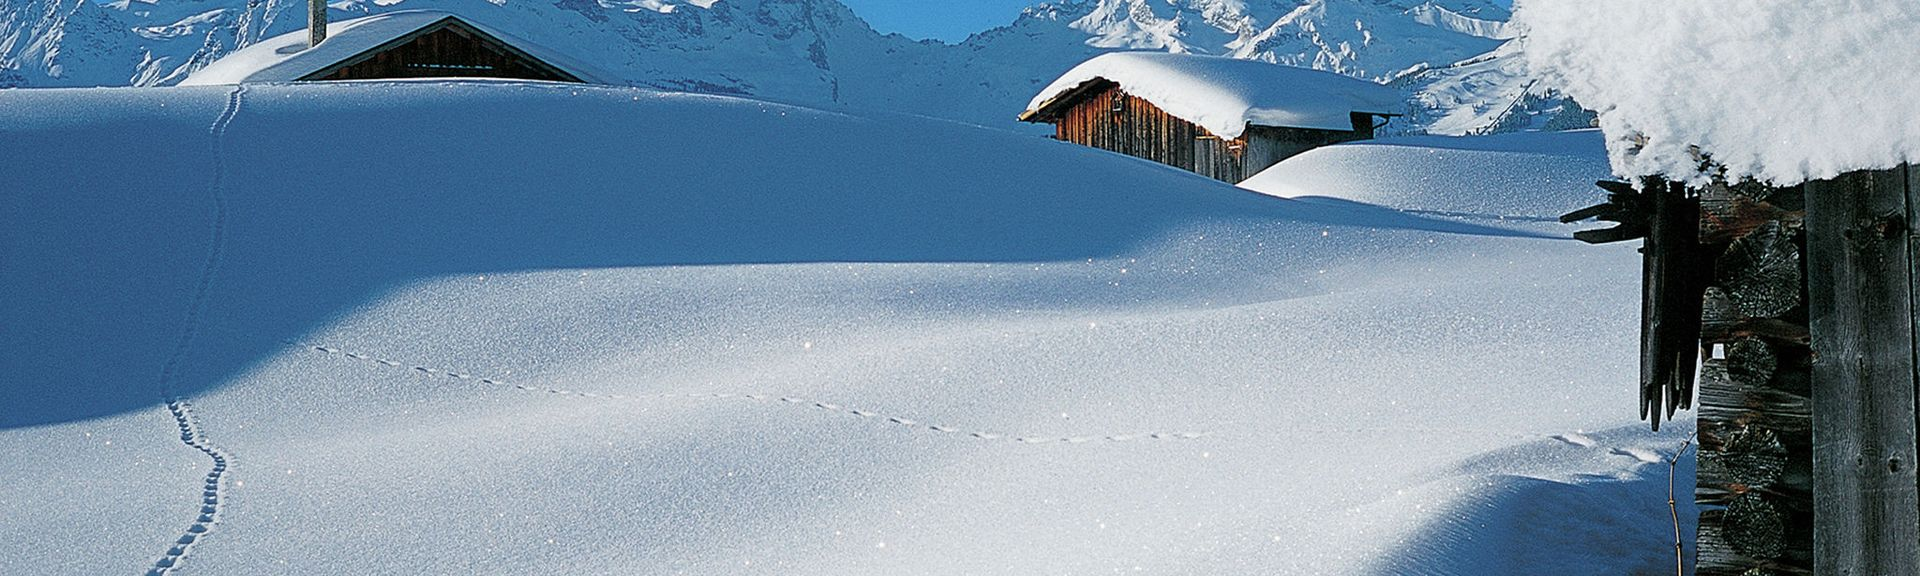 Wolfurt, Austria